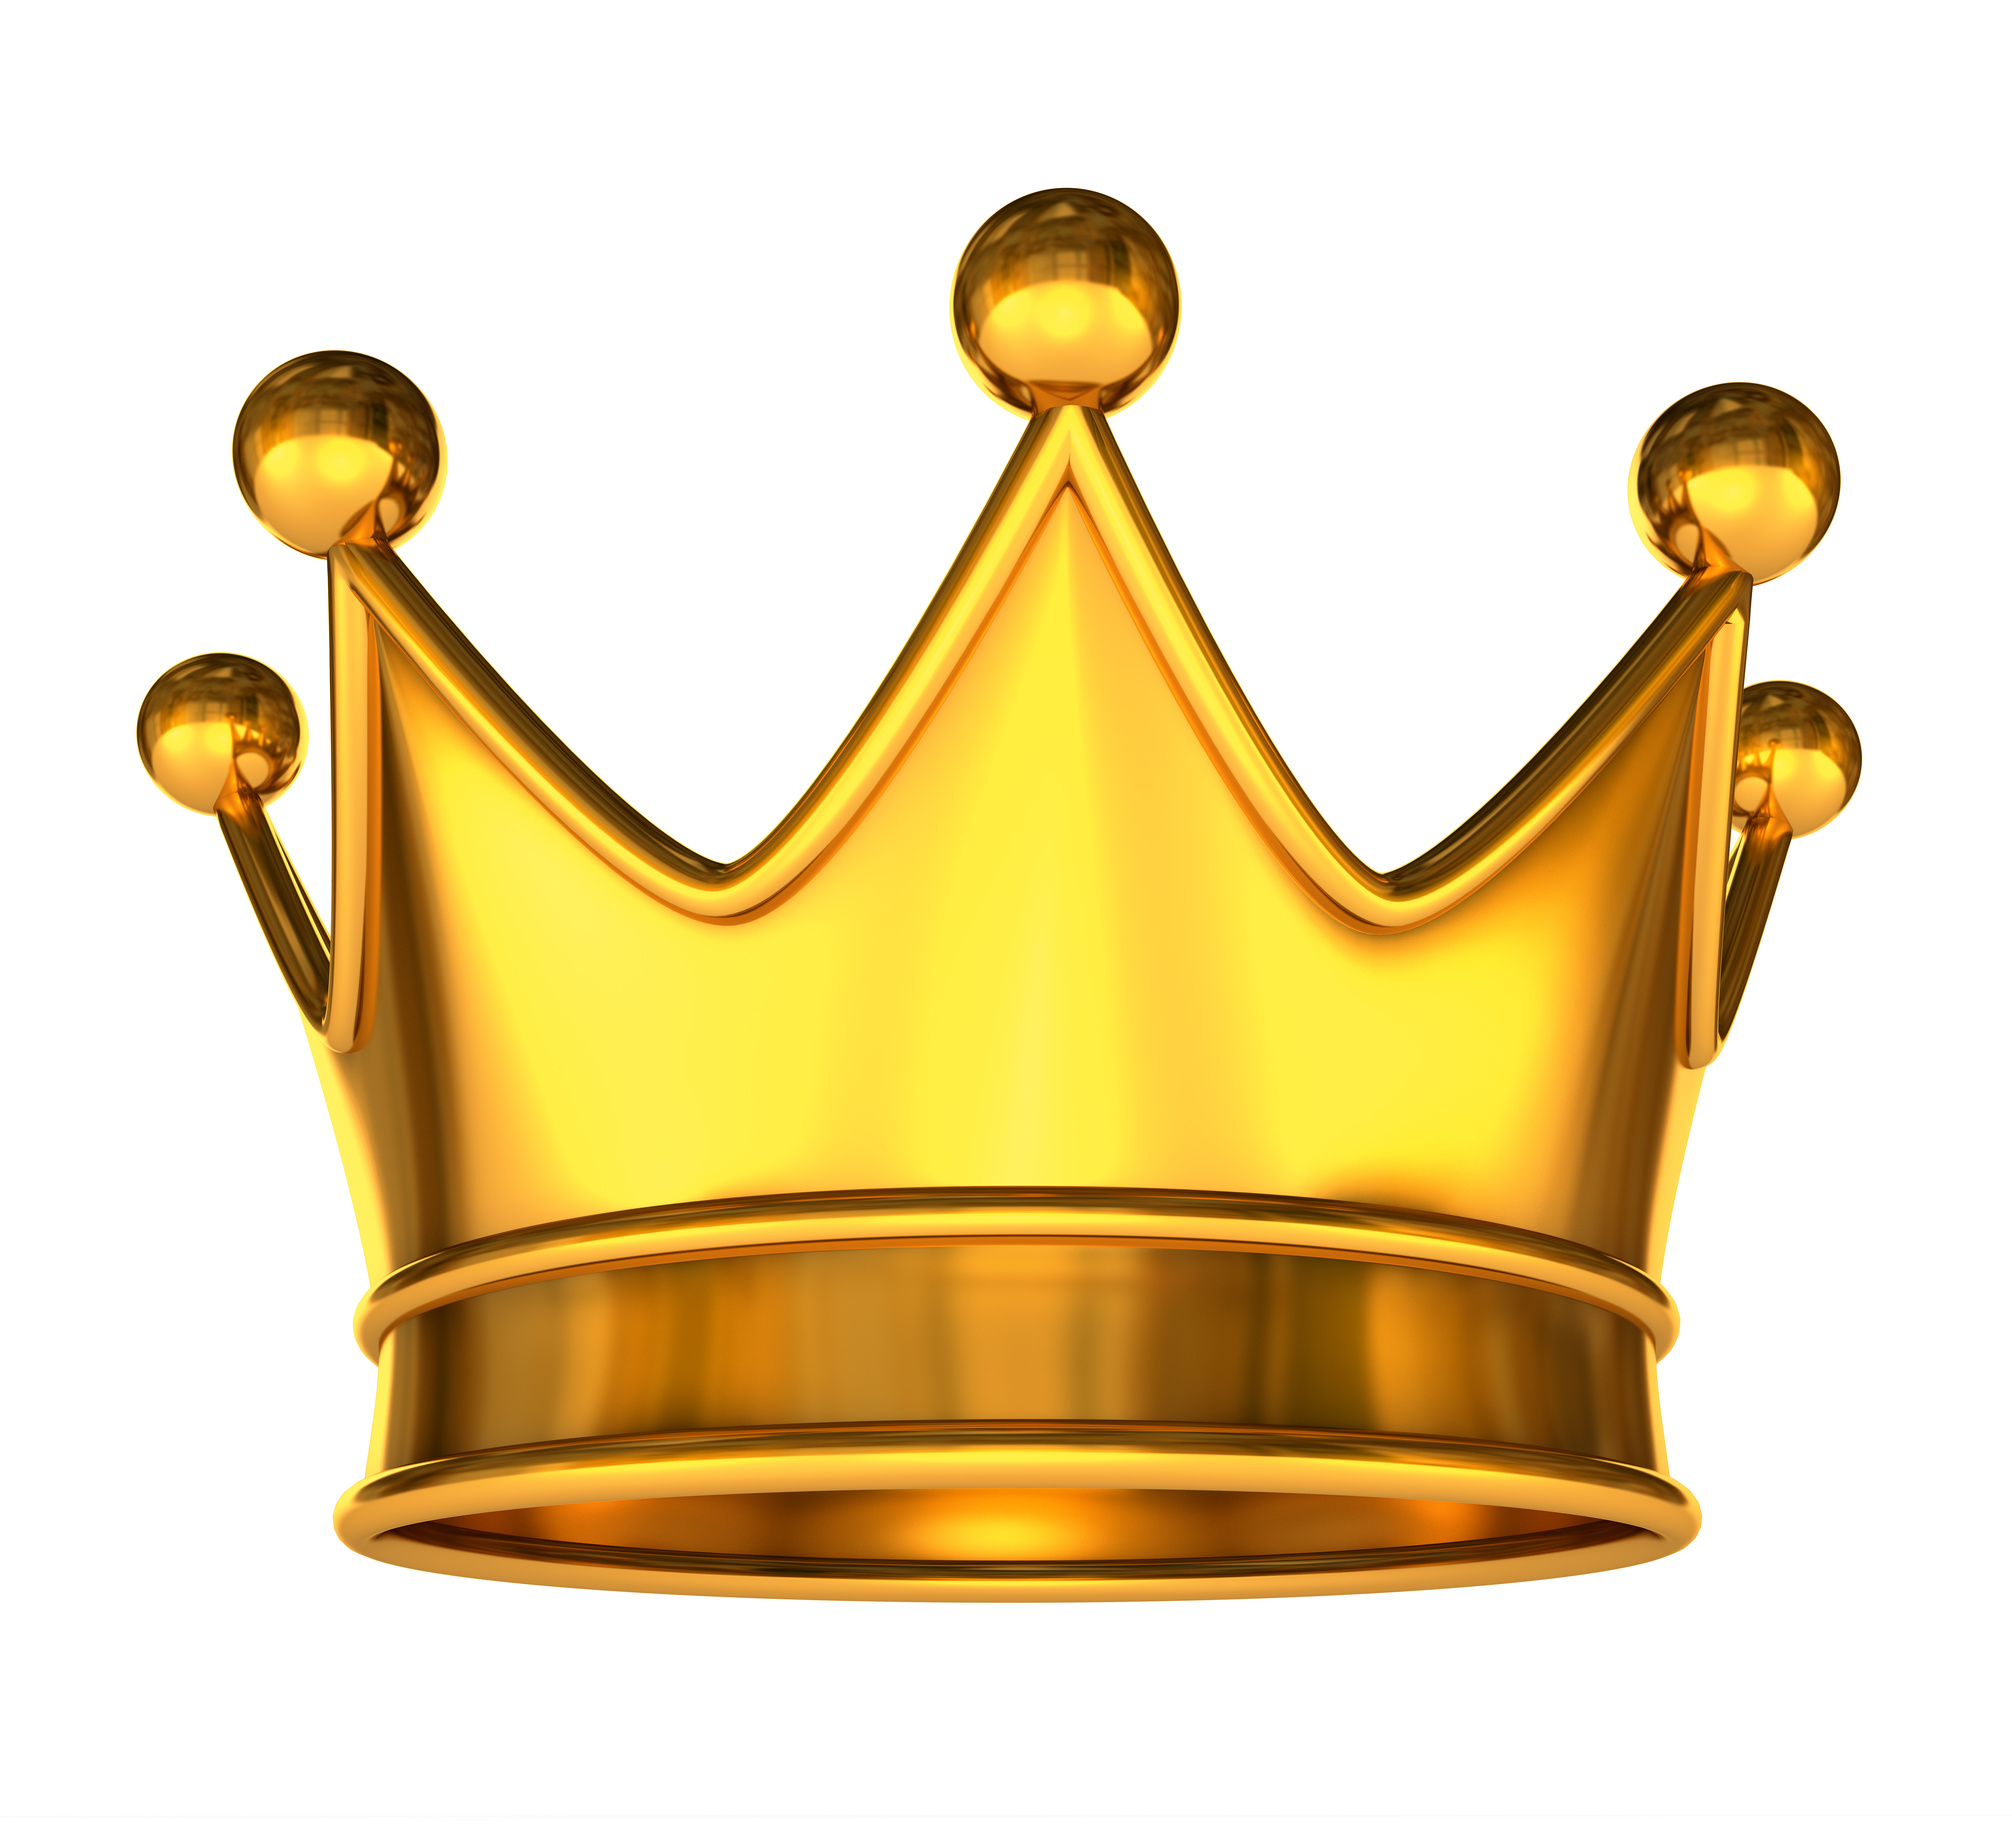 2012x1839 Crown Free Clipart